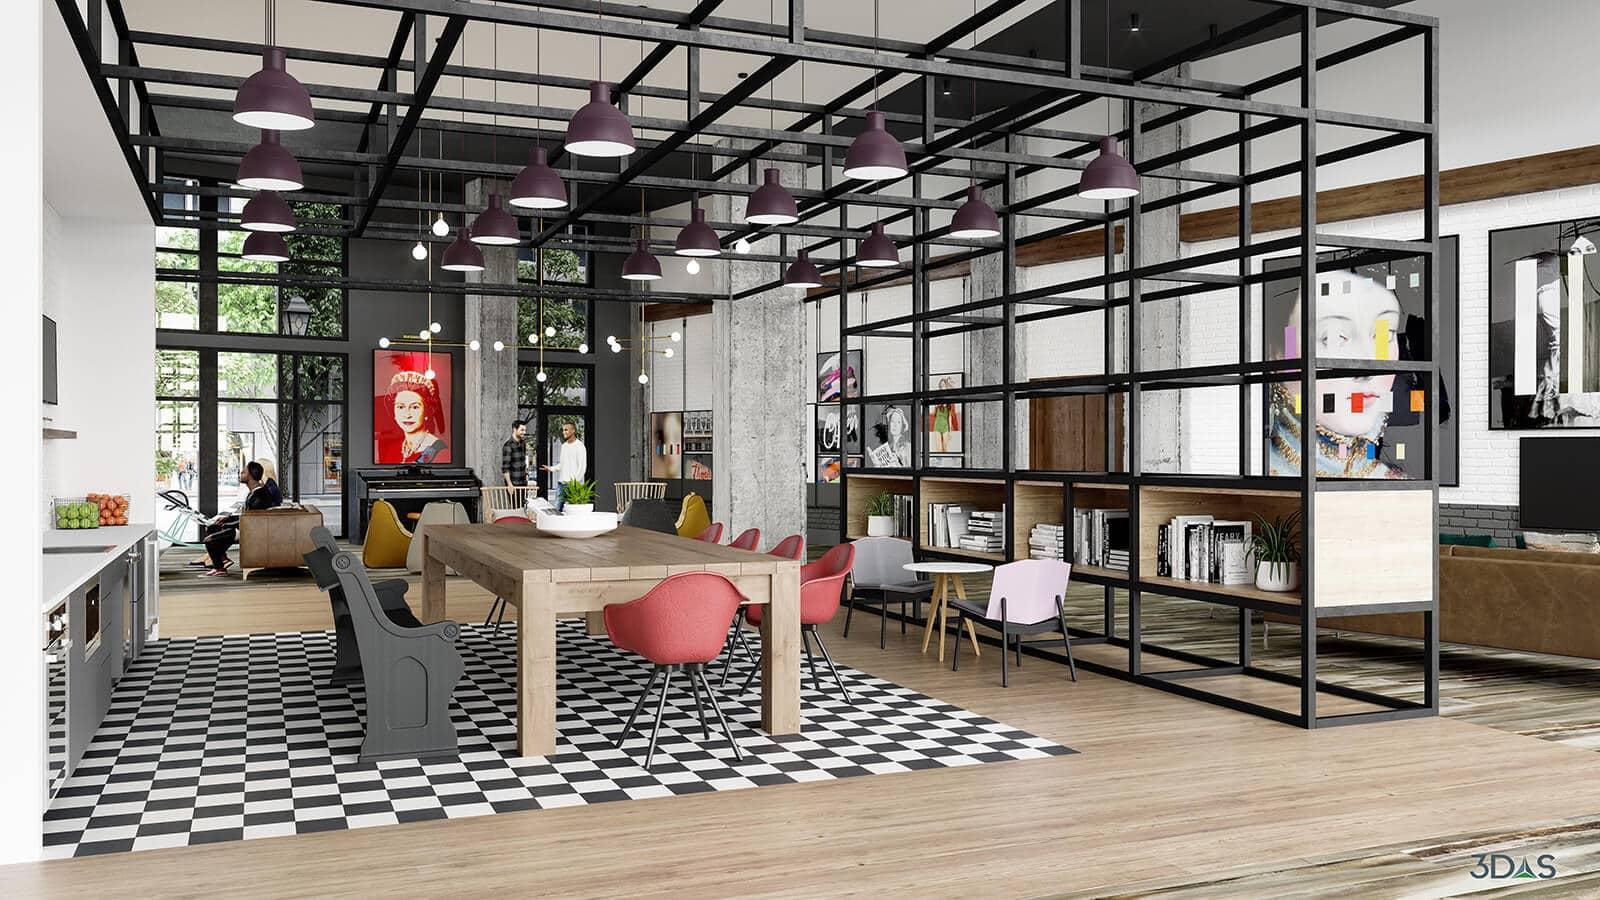 Kitchen & Lobby 3D Rendering for Elan Madison Yards in Atlanta, Georgia. 3D Rendering by 3DAS